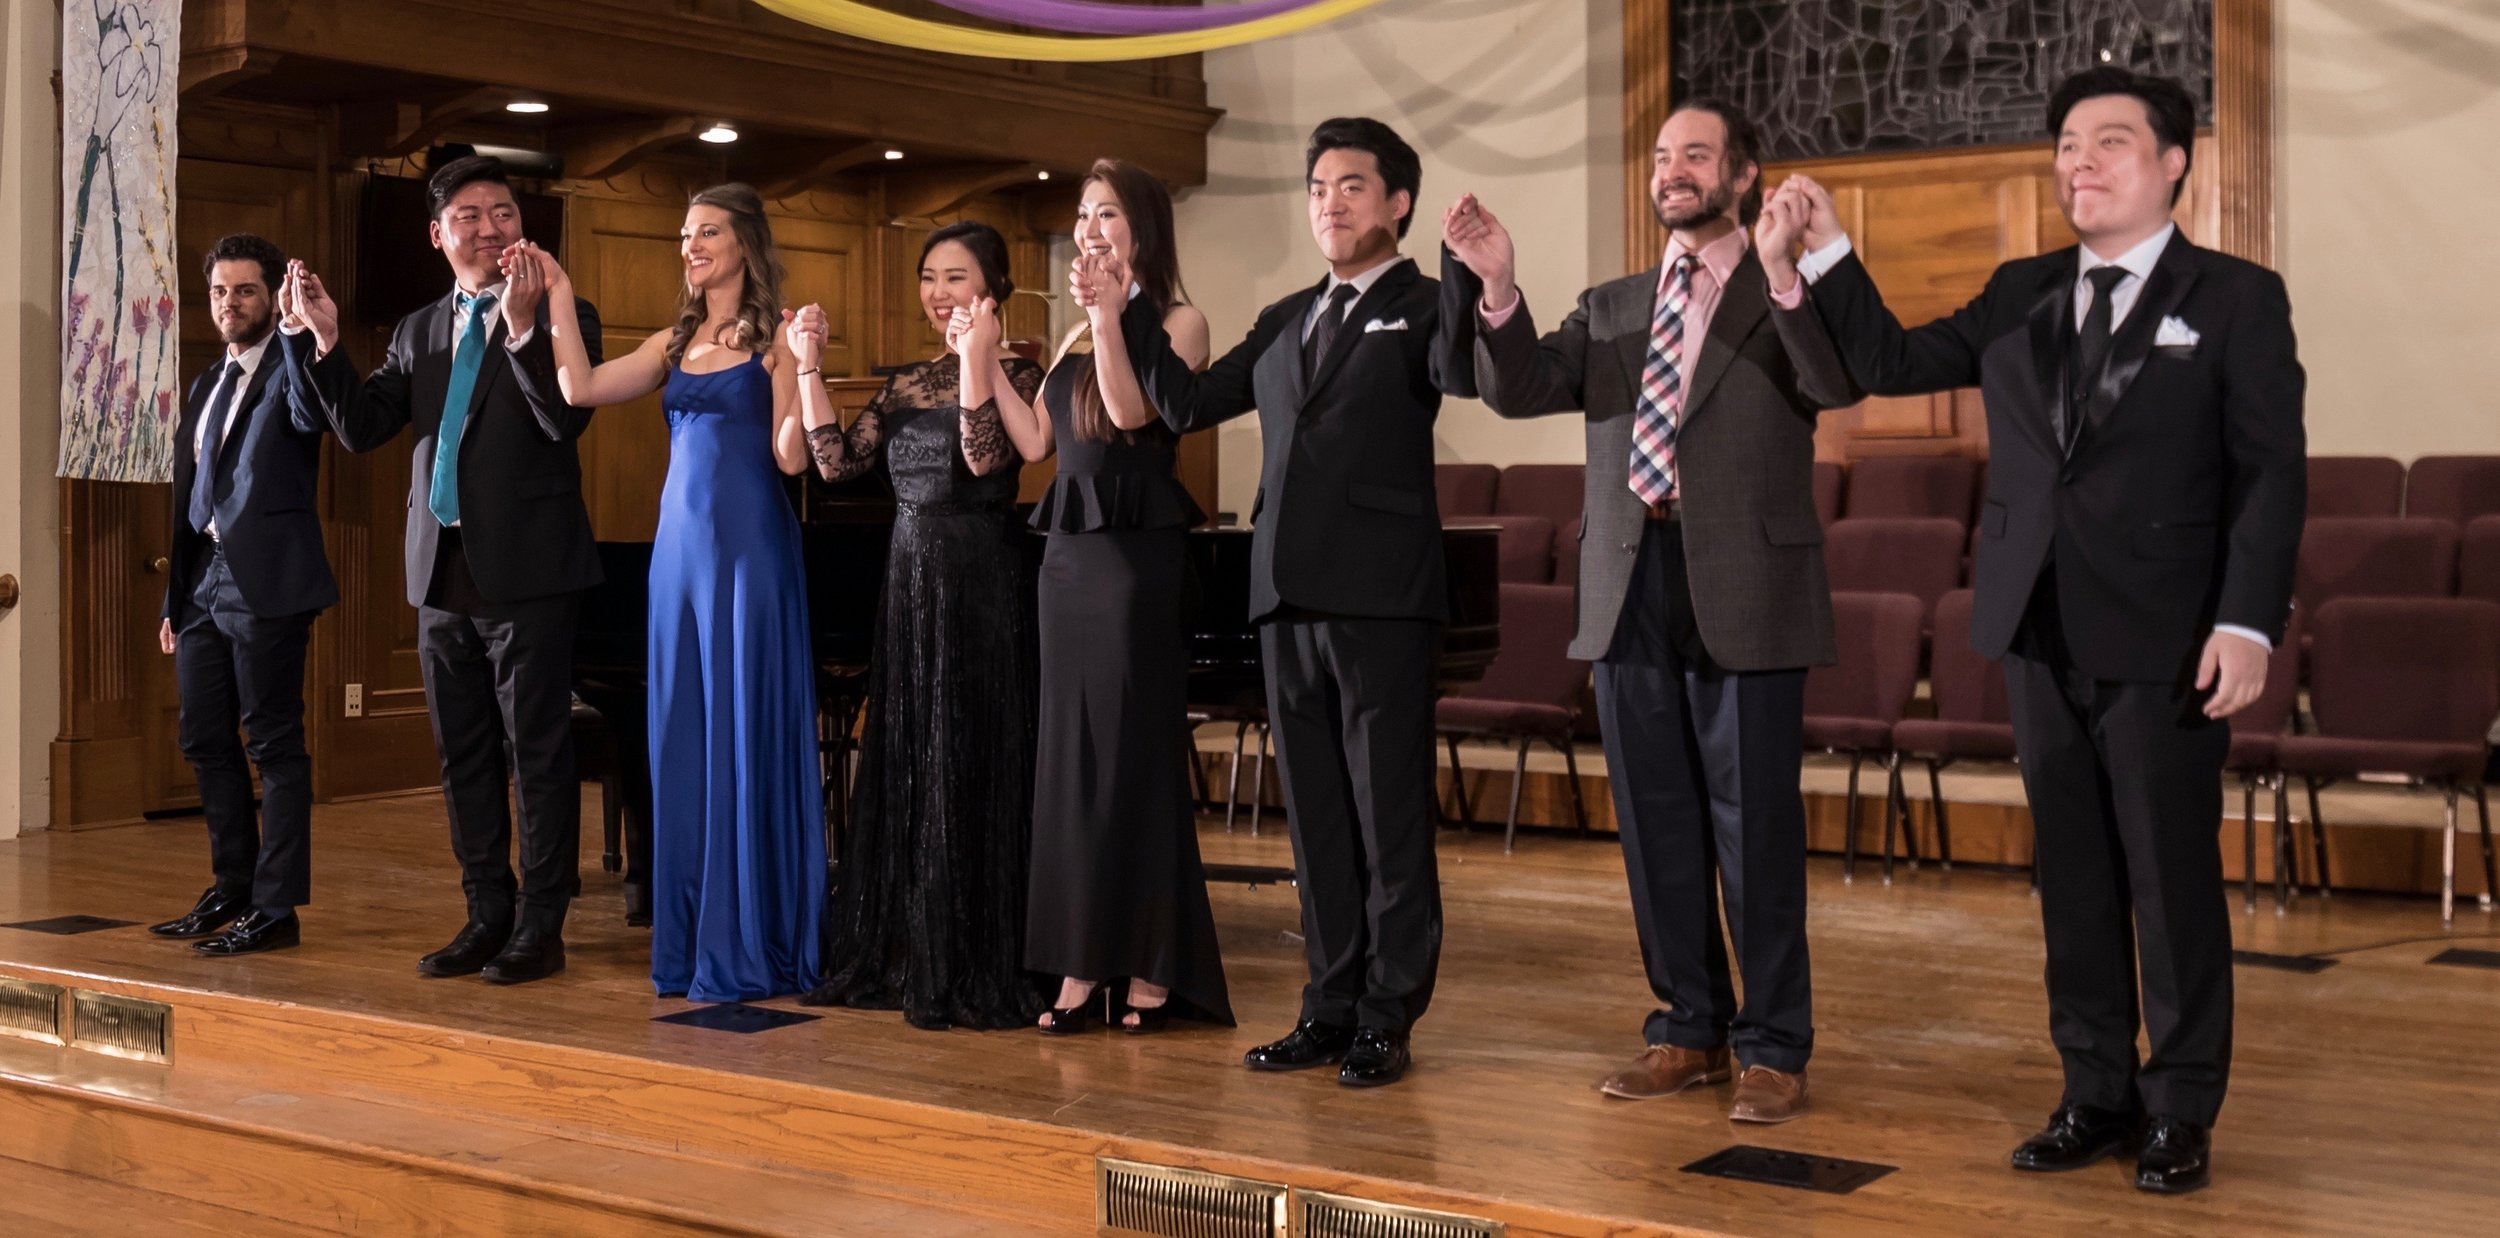 MDLO Institute Concert April 20, 2018    Left to right: Rafael Andrade, SeungHyeon Baek, Sarah Costa, Nayoung Ban, Nina Duan, ChunLai Shang, Joseph Michael Brent, Yongxi Chen